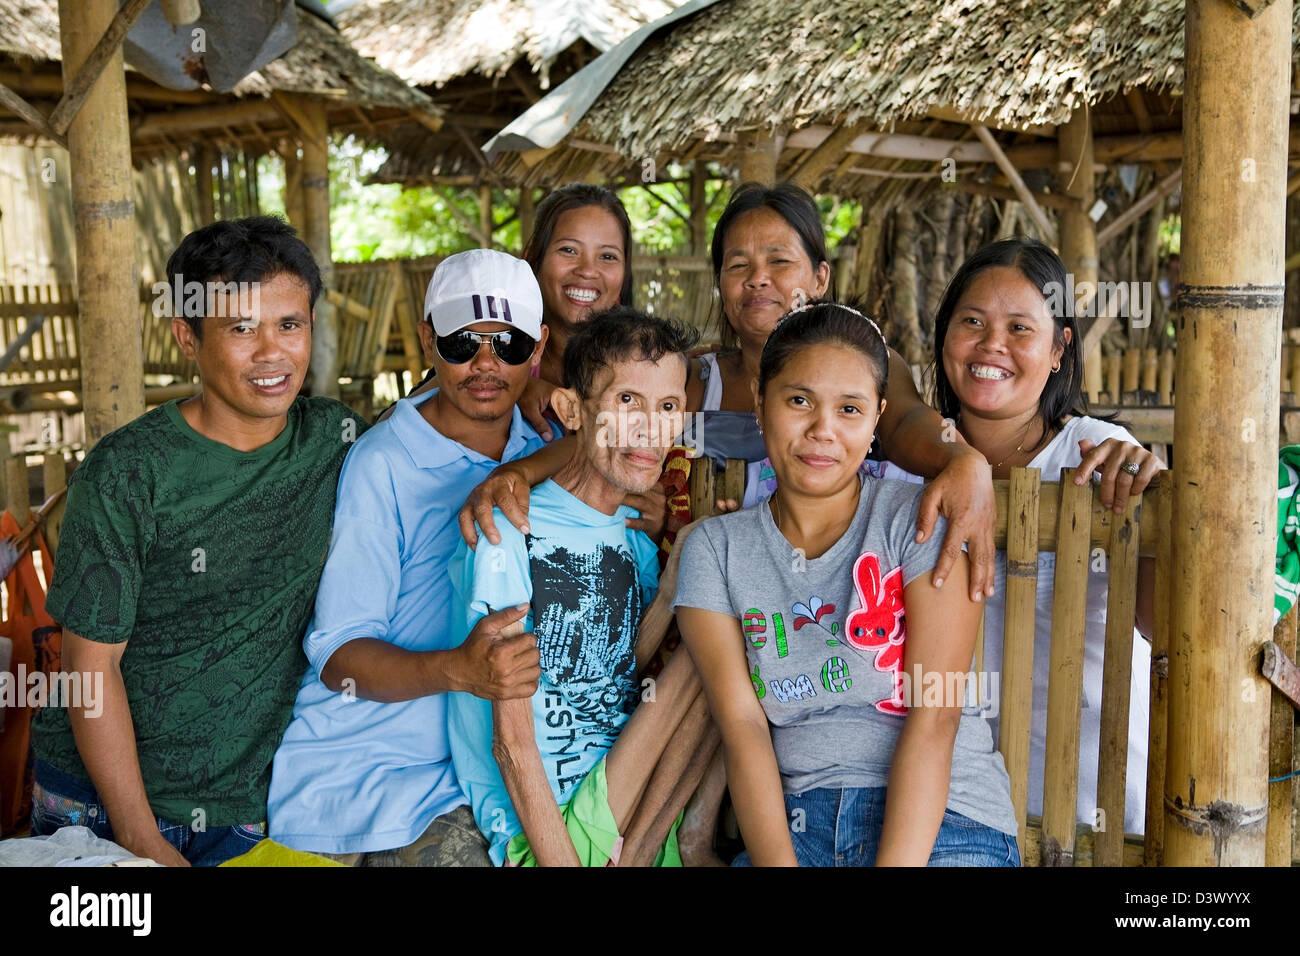 Philippine Islands Family Portrait - Stock Image